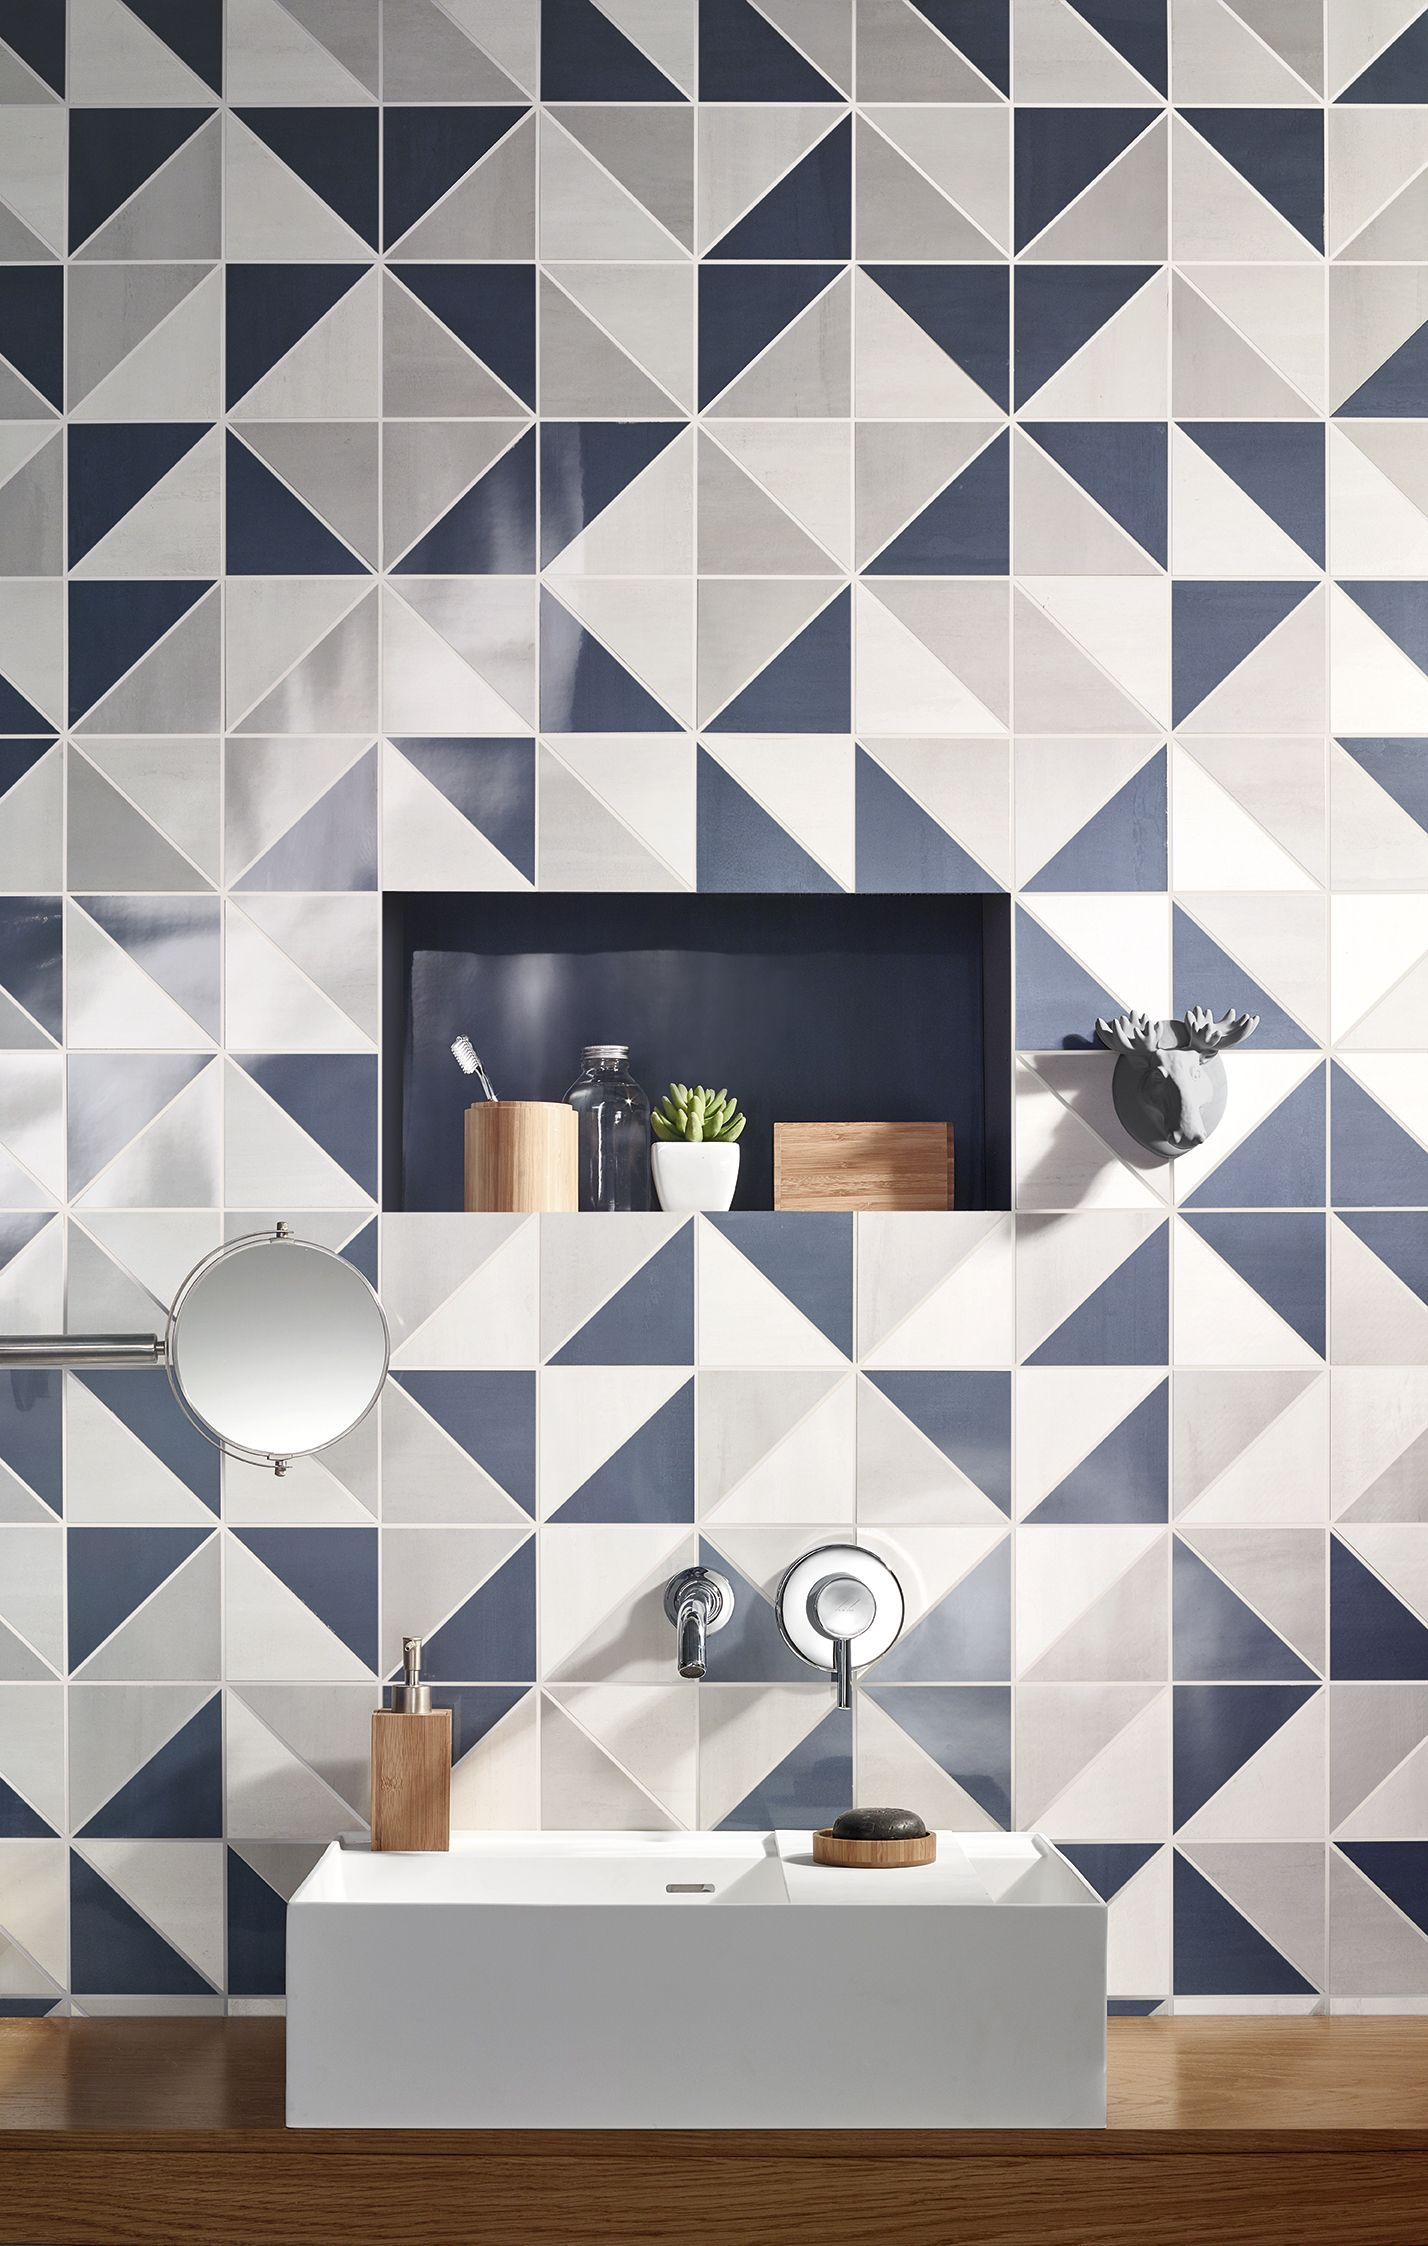 Contemporary geometric tile design by Exto | Bathroom Tiles ...